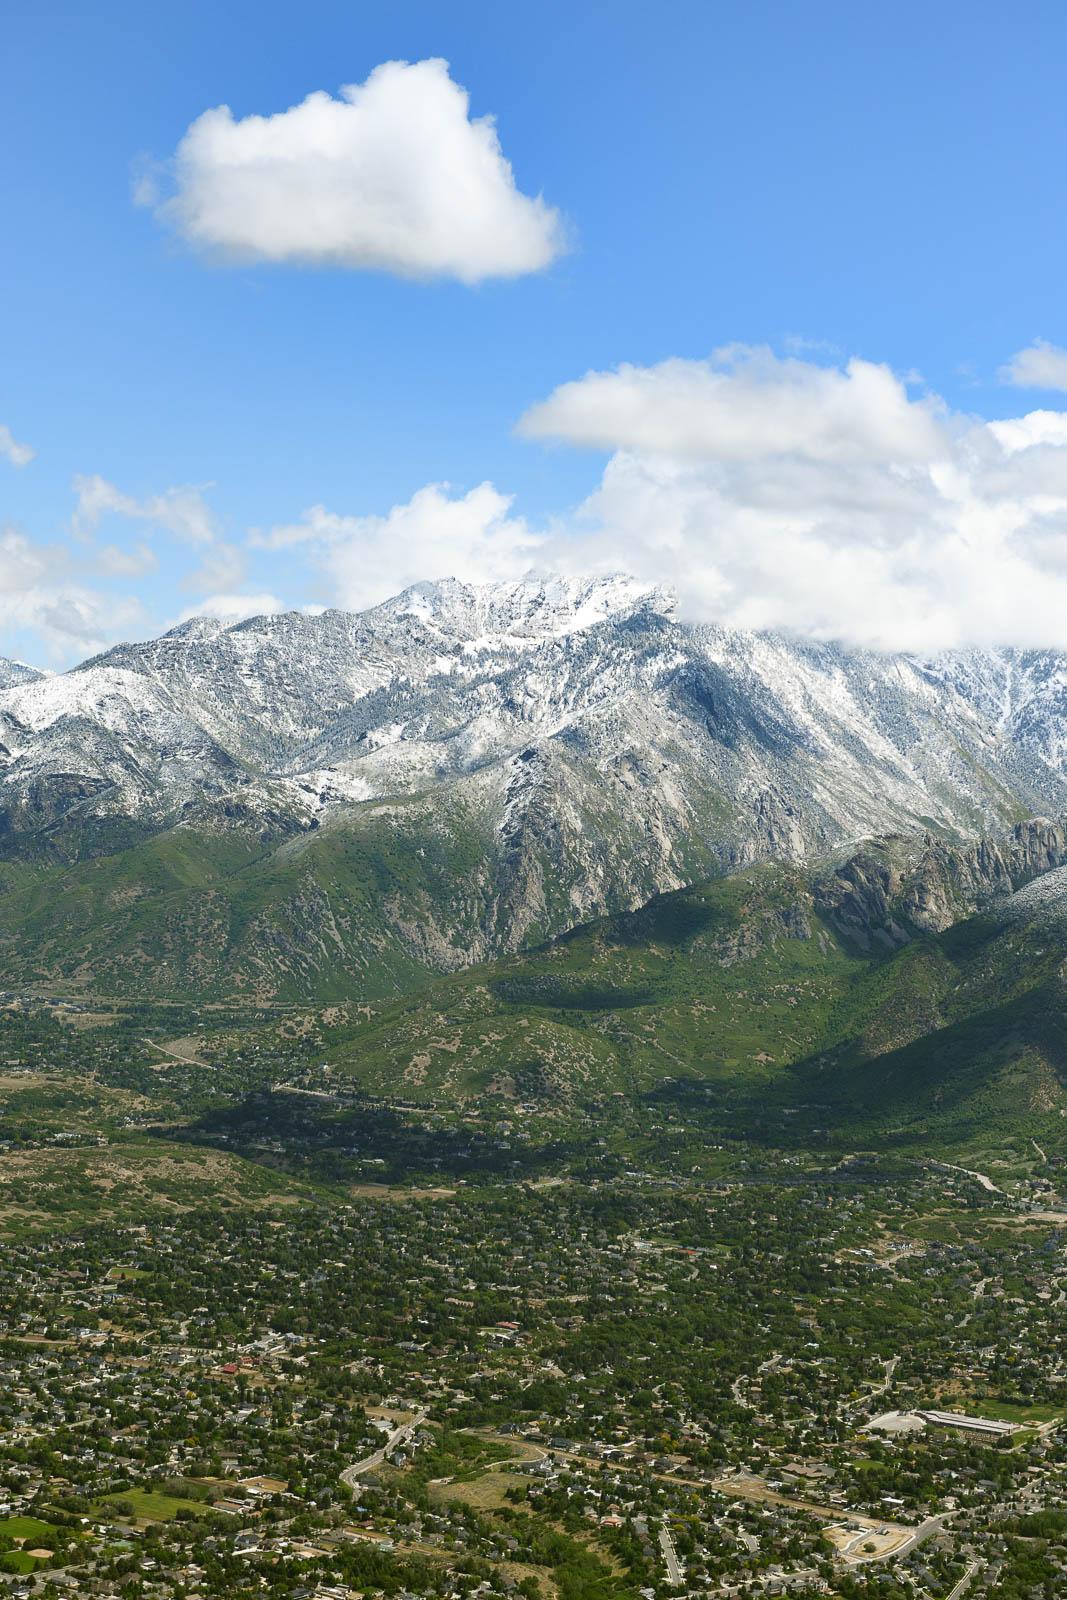 Snowy peaks near Salt Lake City